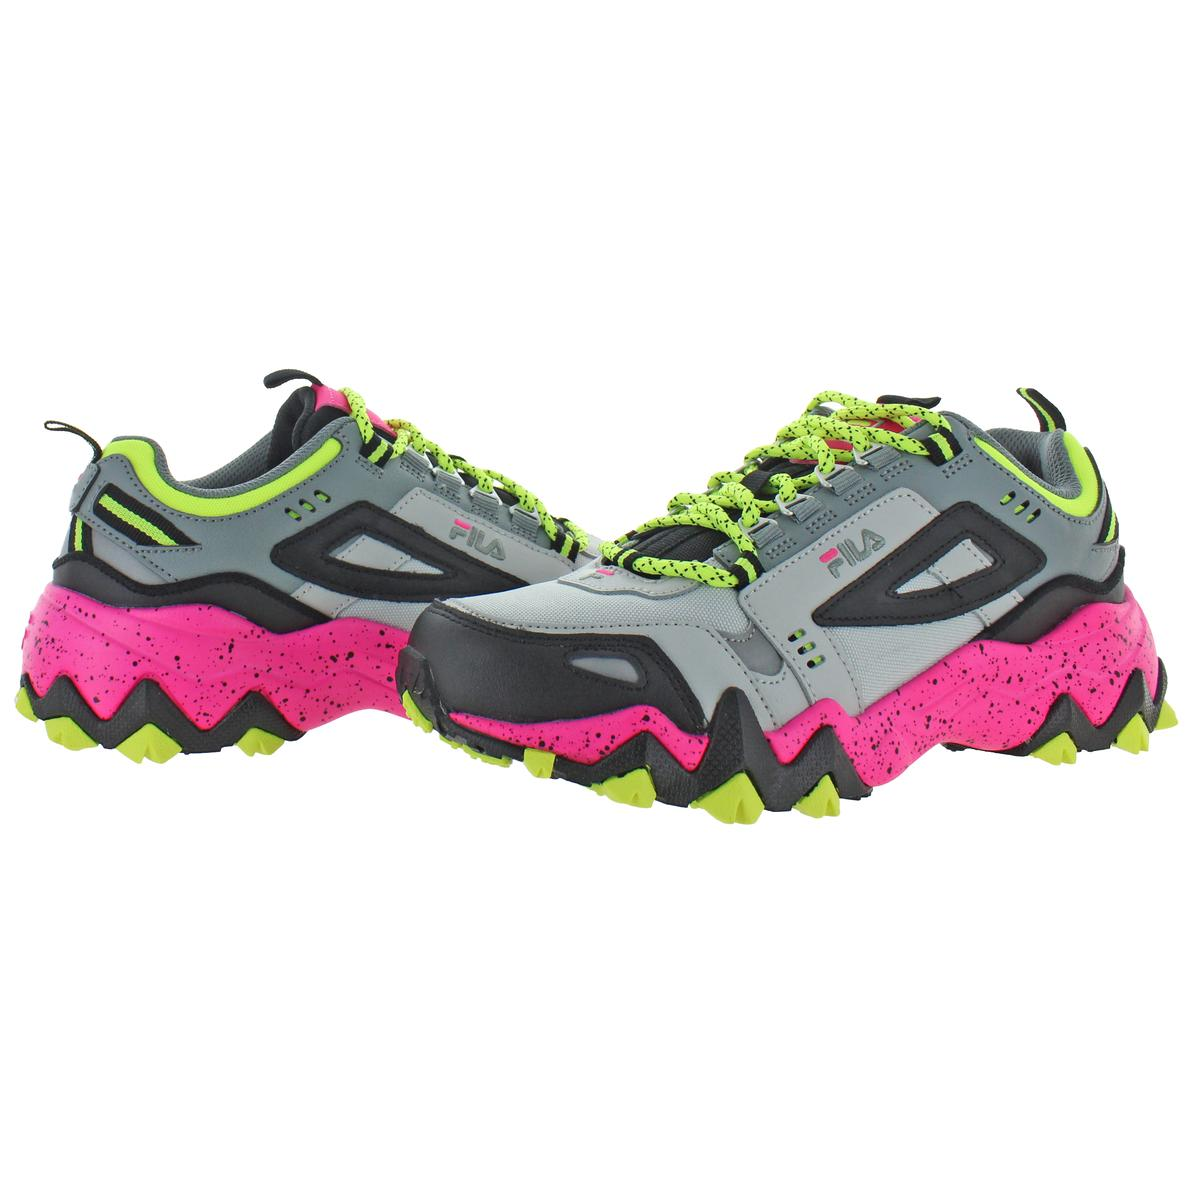 thumbnail 6 - Fila Women's Oakmont Leather Retro-Inspired Chunky Athletic Hiking Trail Sneaker